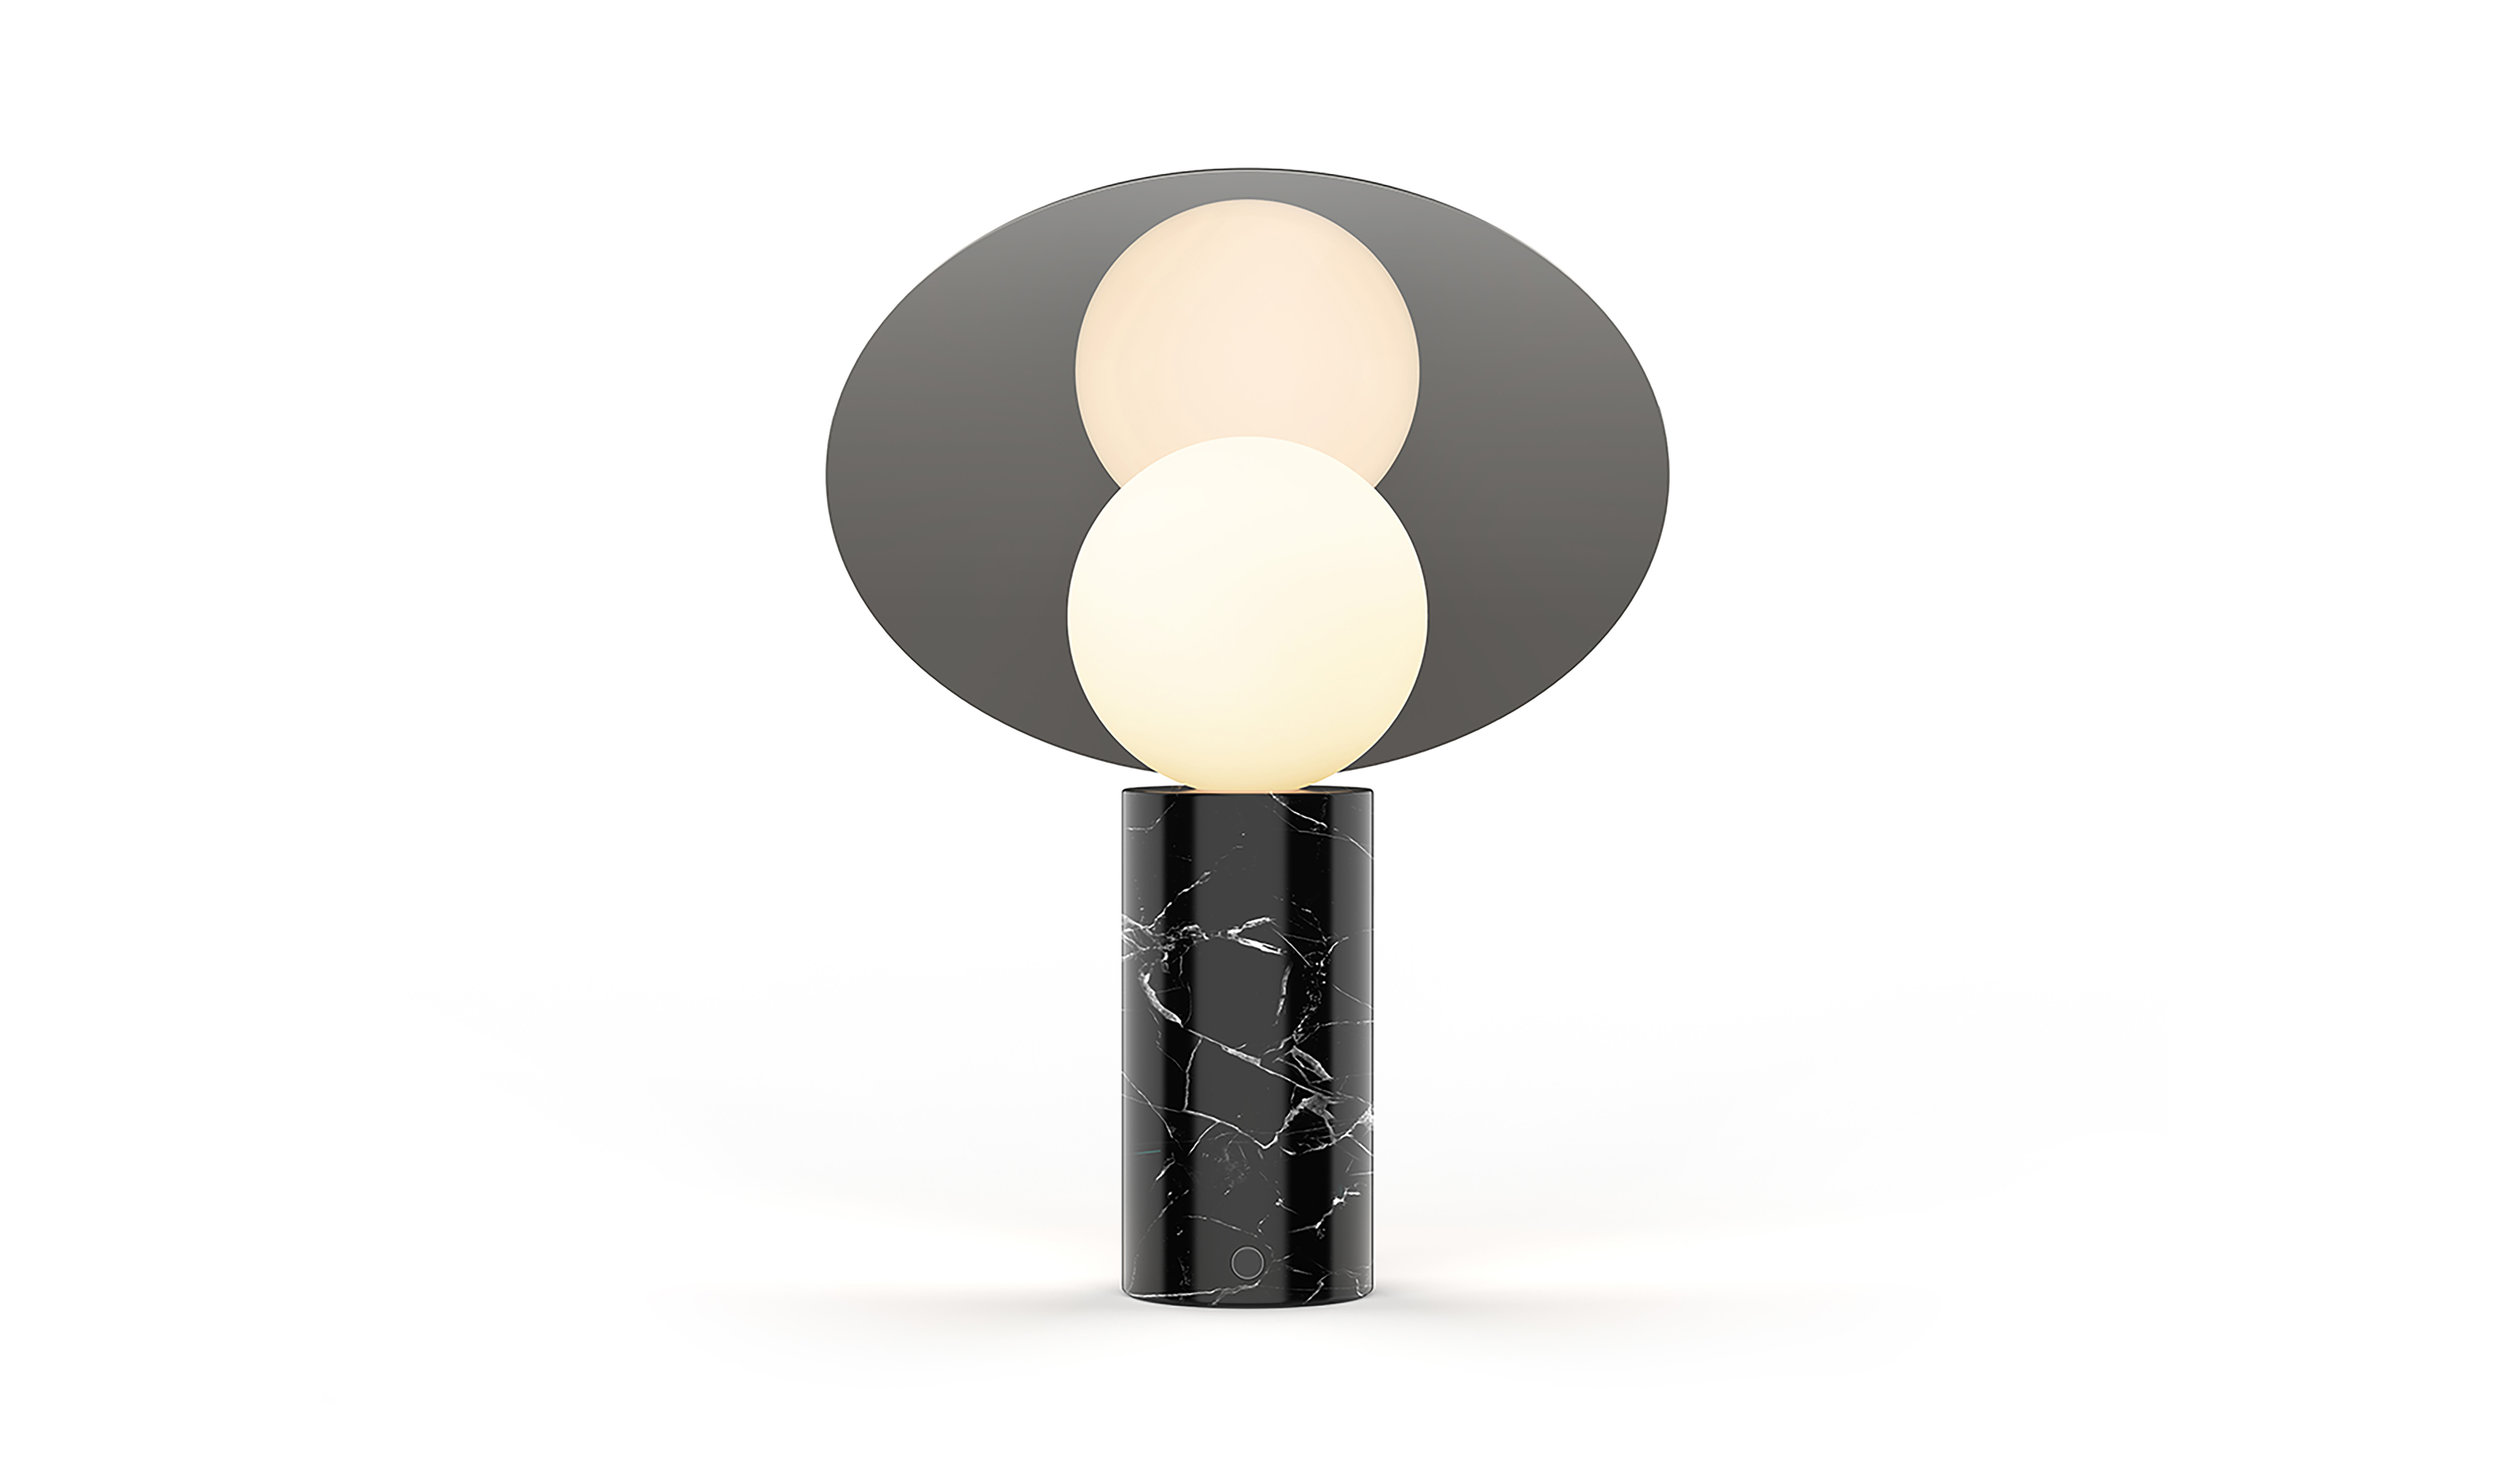 Bola Disc Front-Bk-photo globe-v2 push button_300.jpg